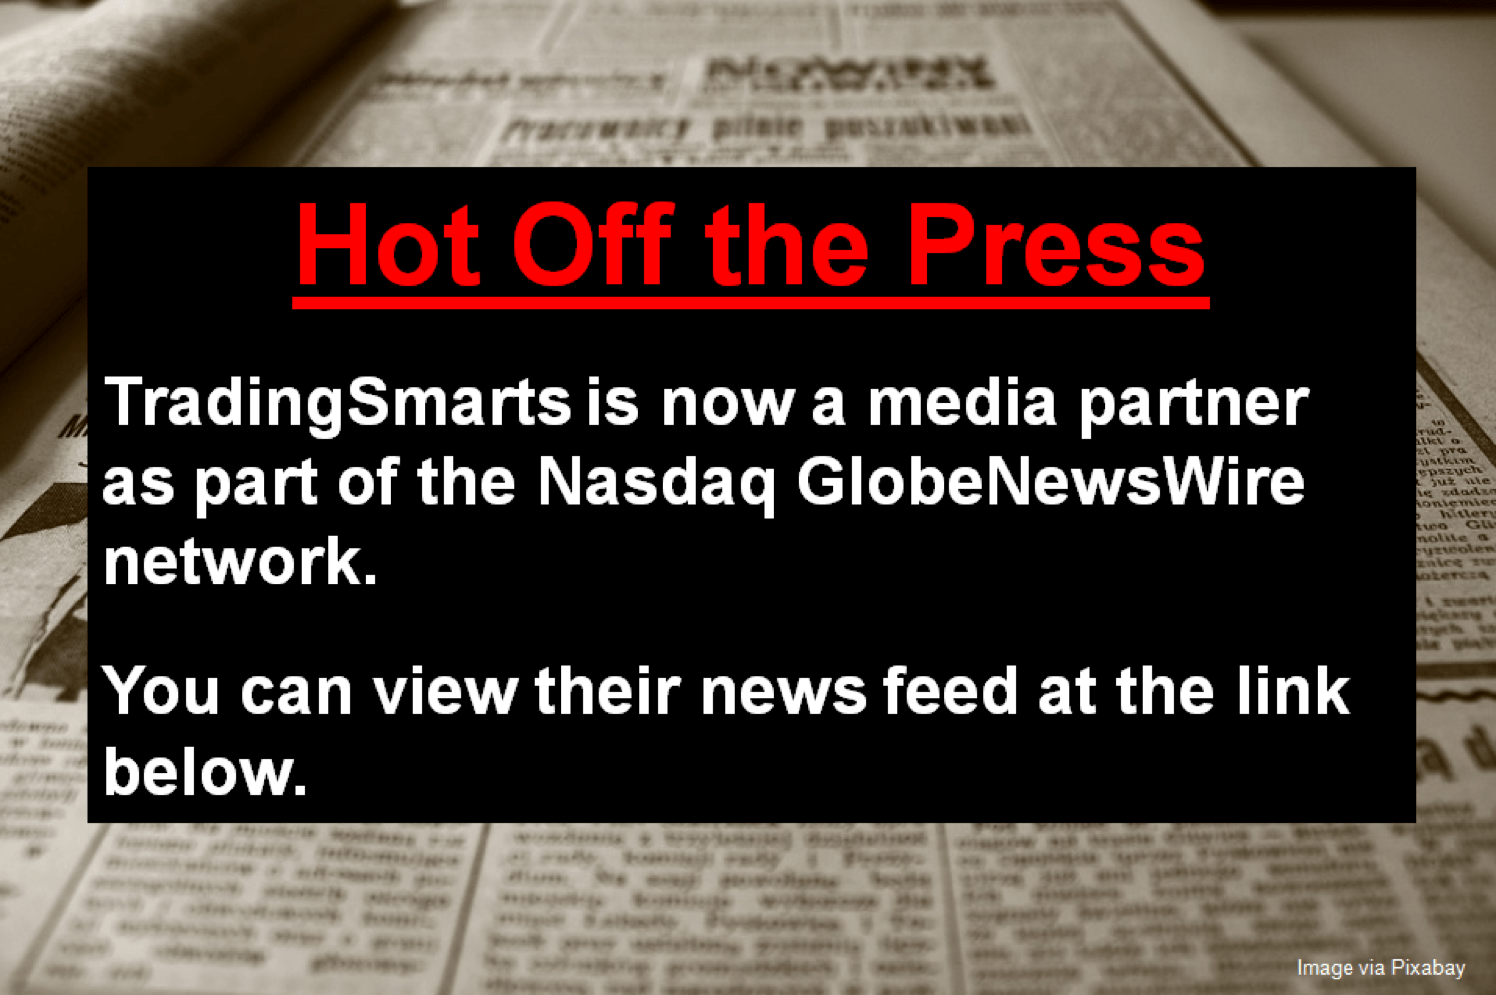 Trading news feed